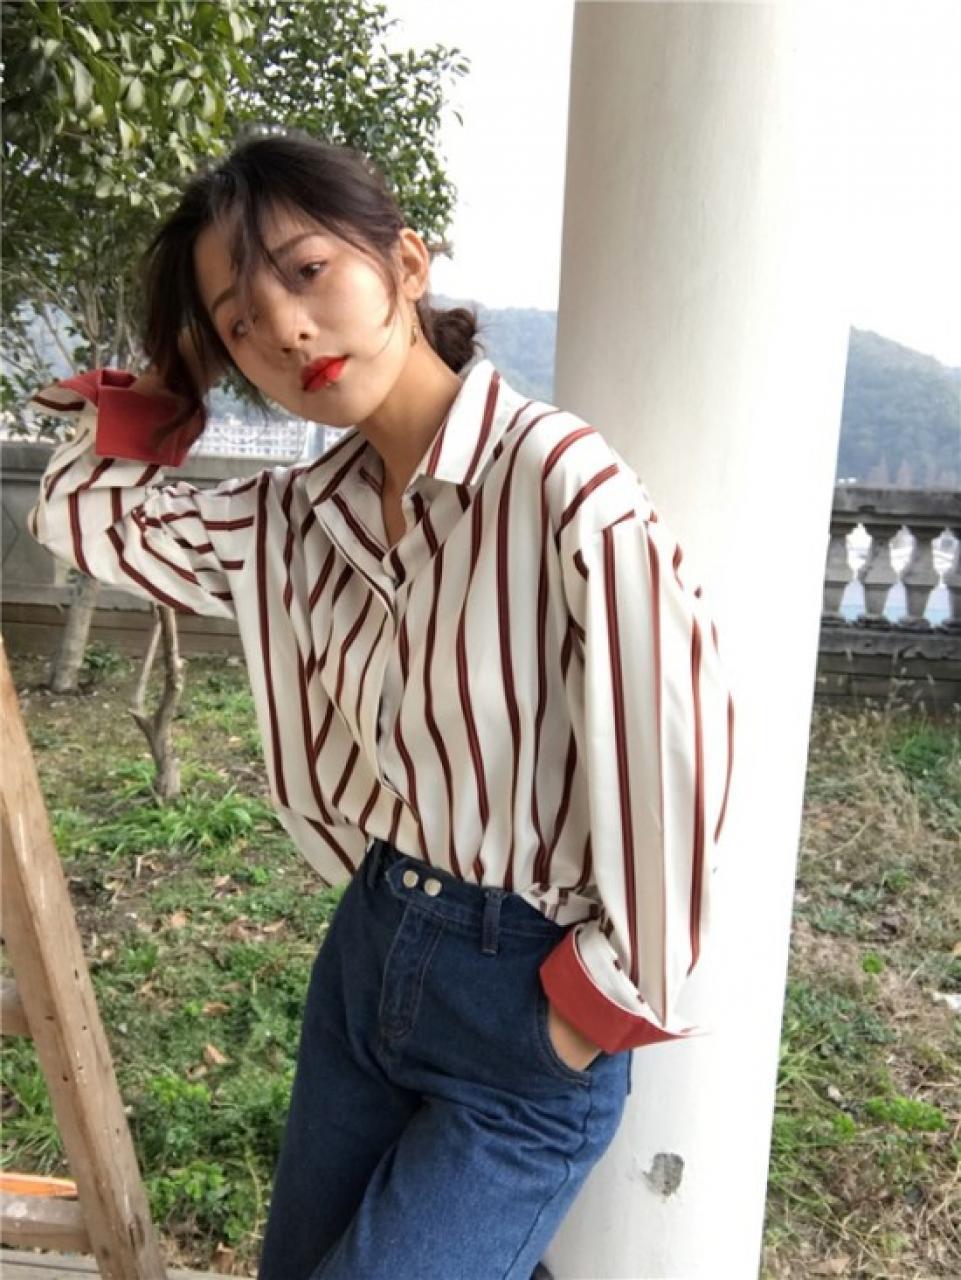 Áo sơ mi công sở nữ - Cách phối áo sơ mi công sở nữ đẹp cho ngày thu nắng vàng